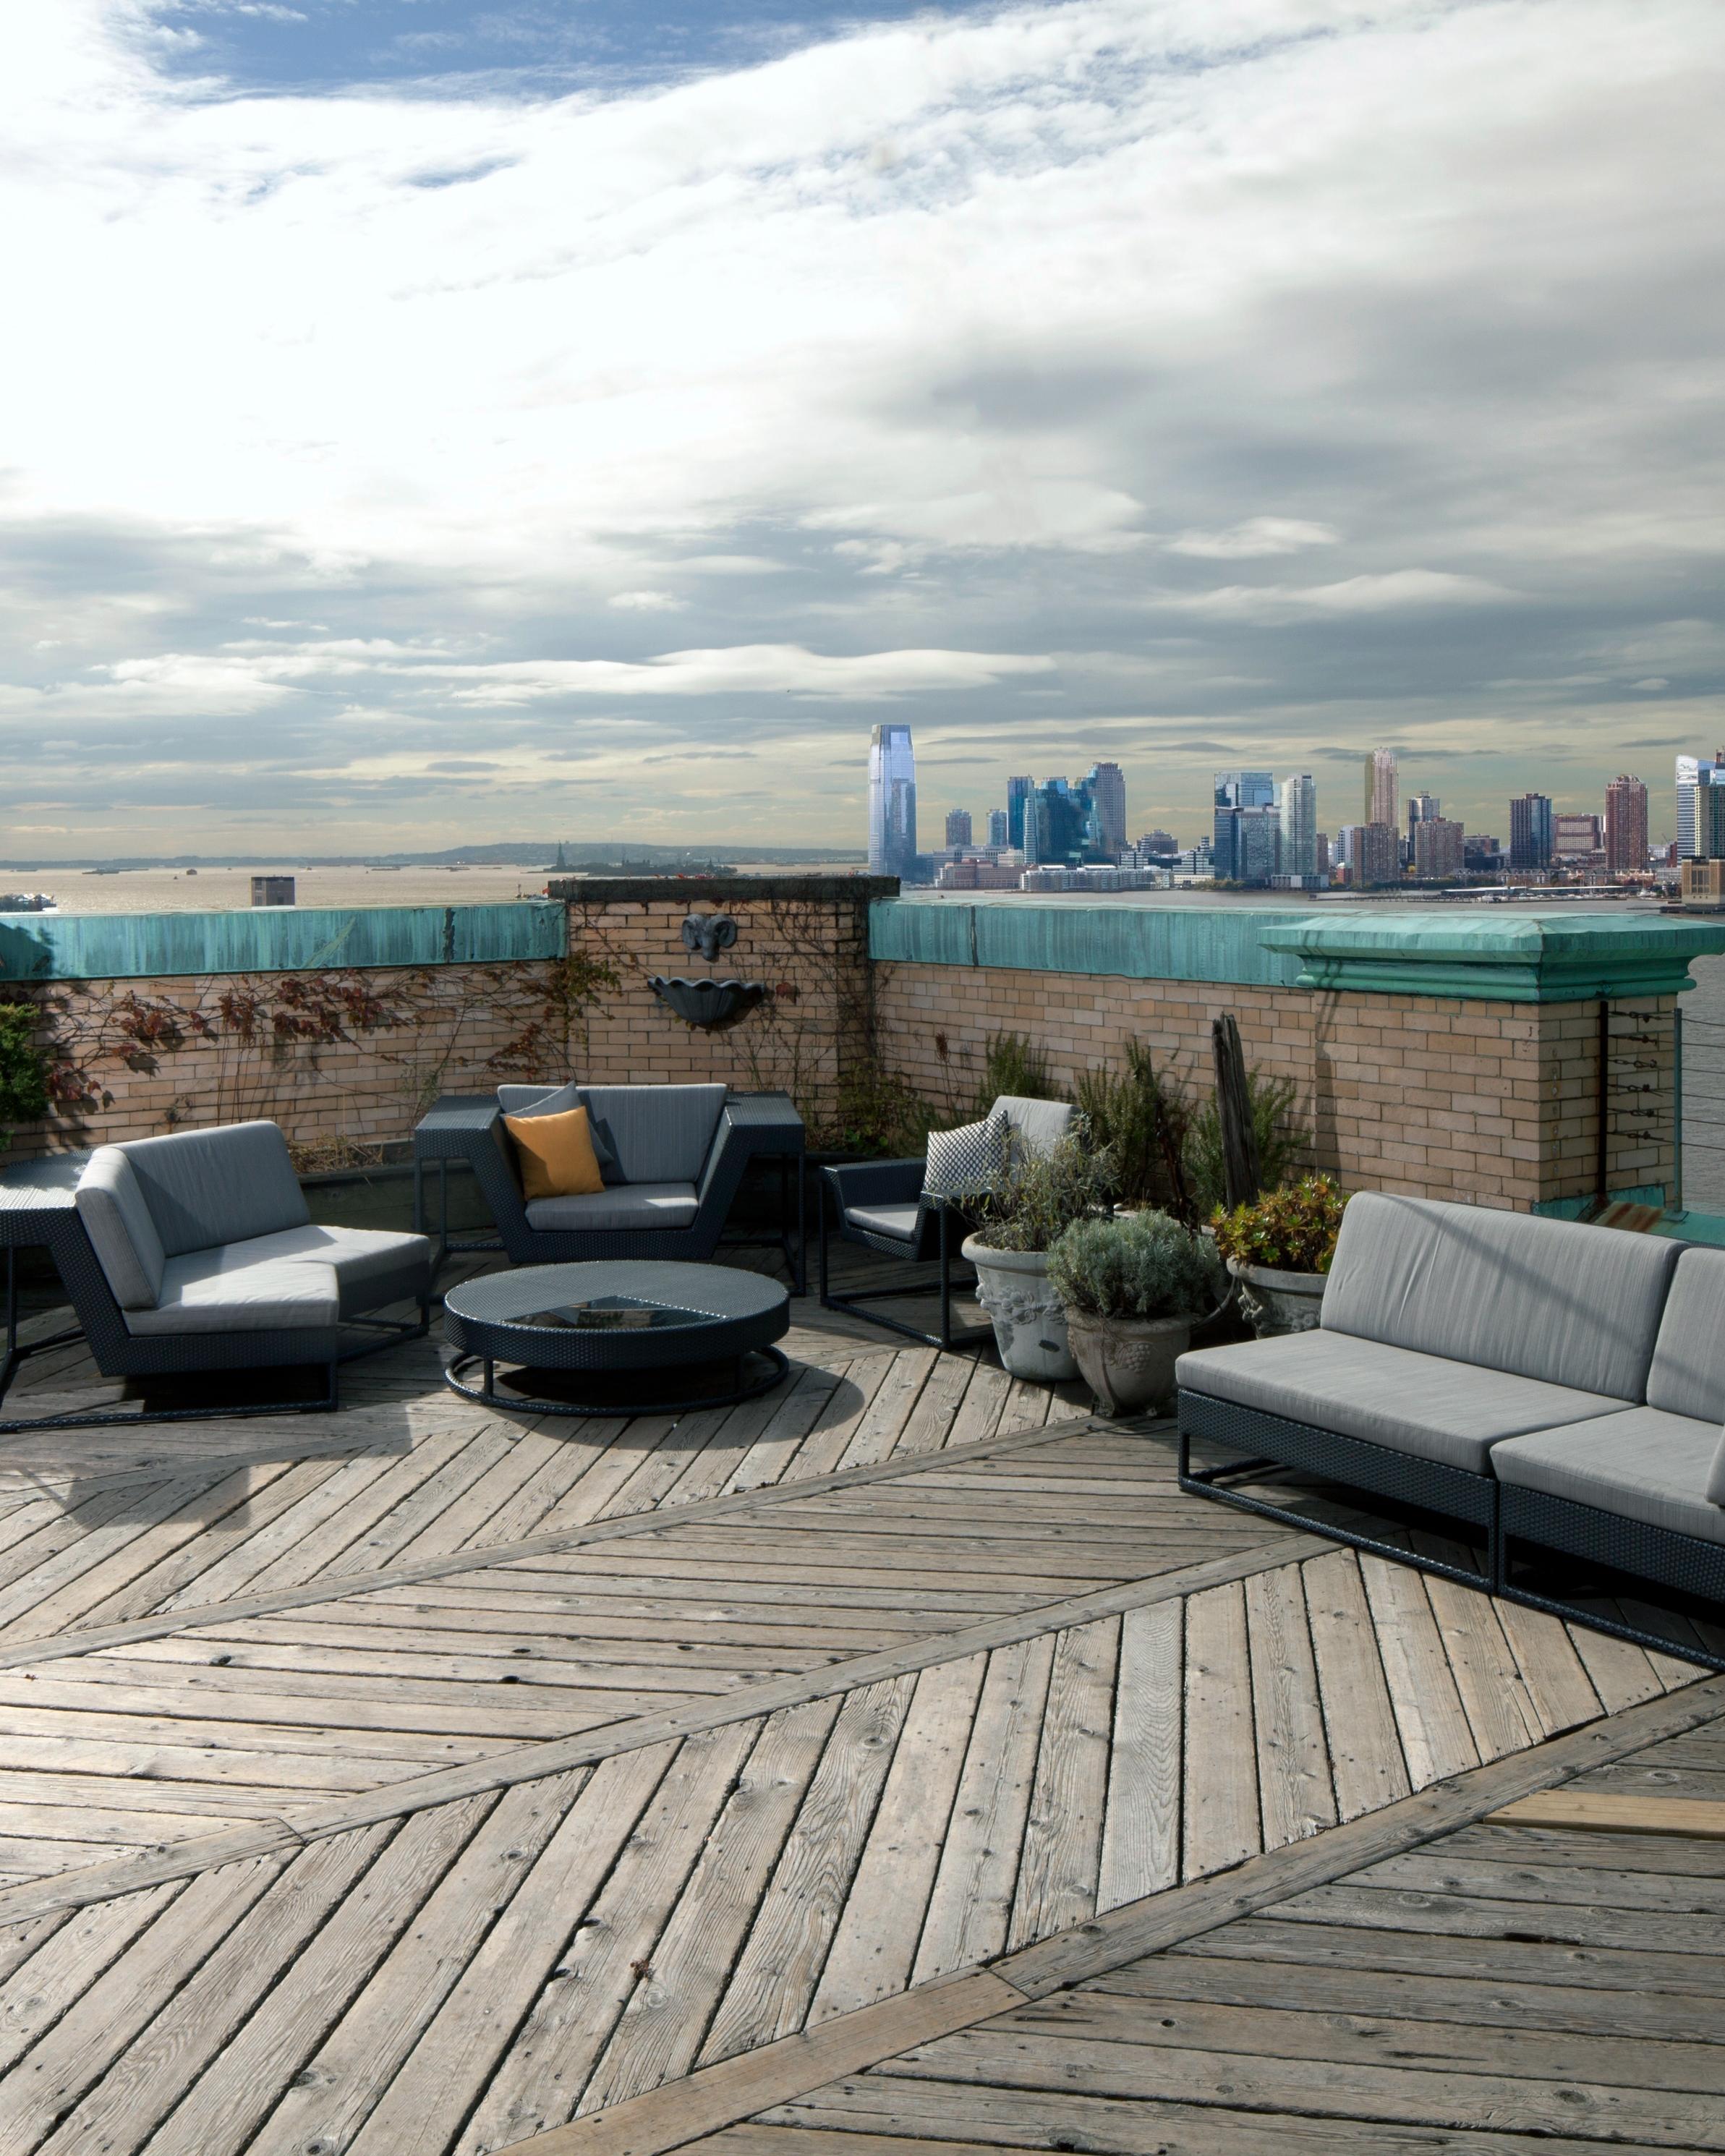 nyc-proposal-spot-ramscale-studio-rooftop-hudson-1114.jpg